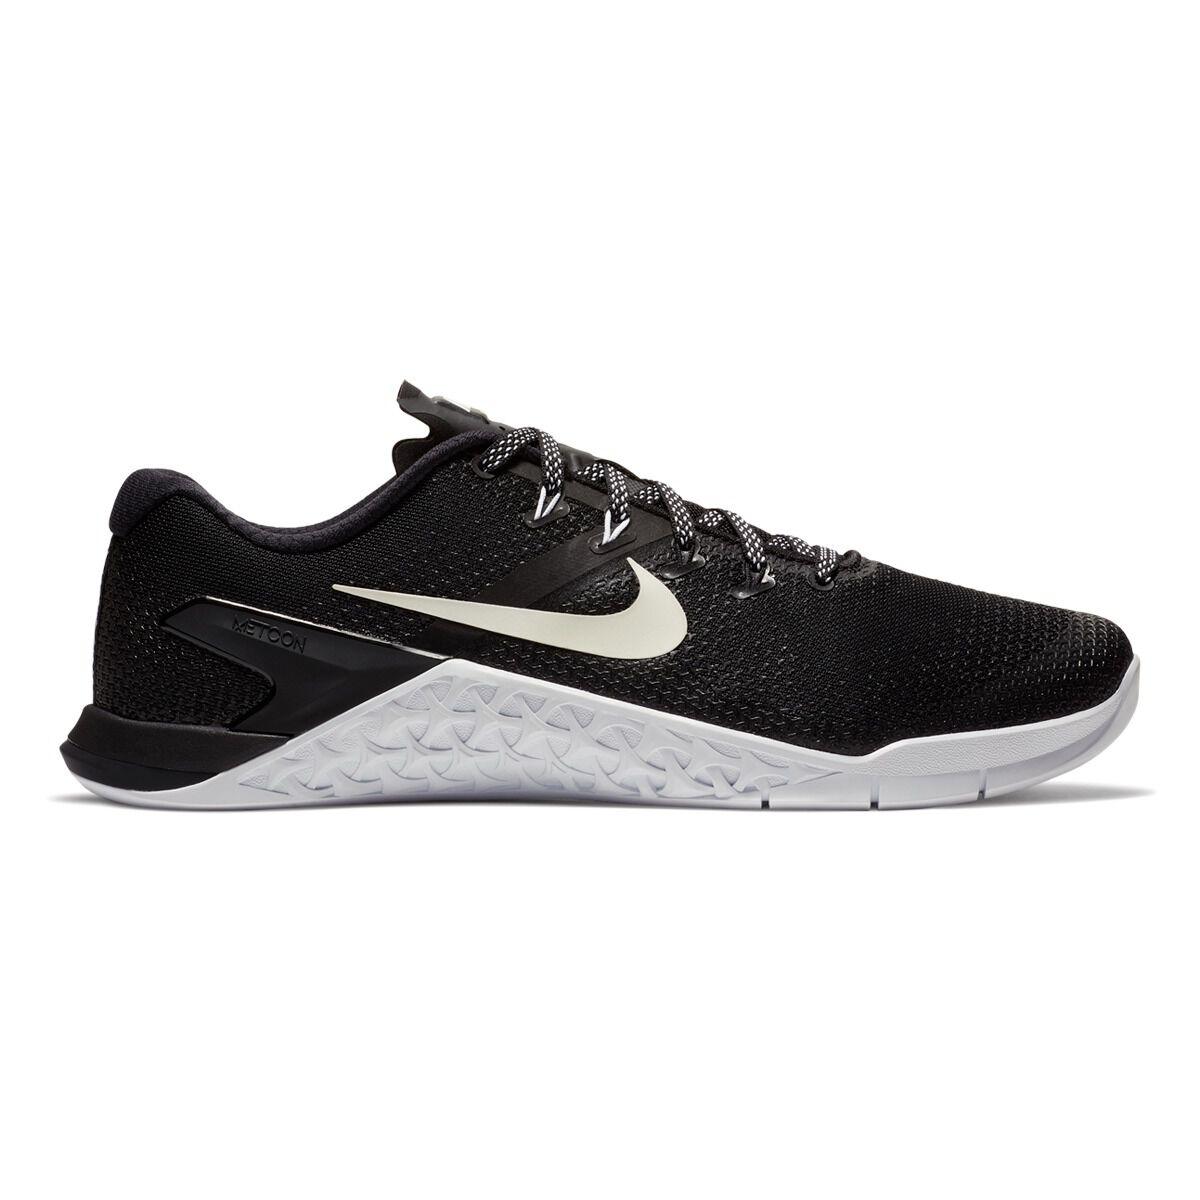 938bc19271a ... cheapest nike metcon 4 mens training shoes black white us 12 black  white b7ab9 080da